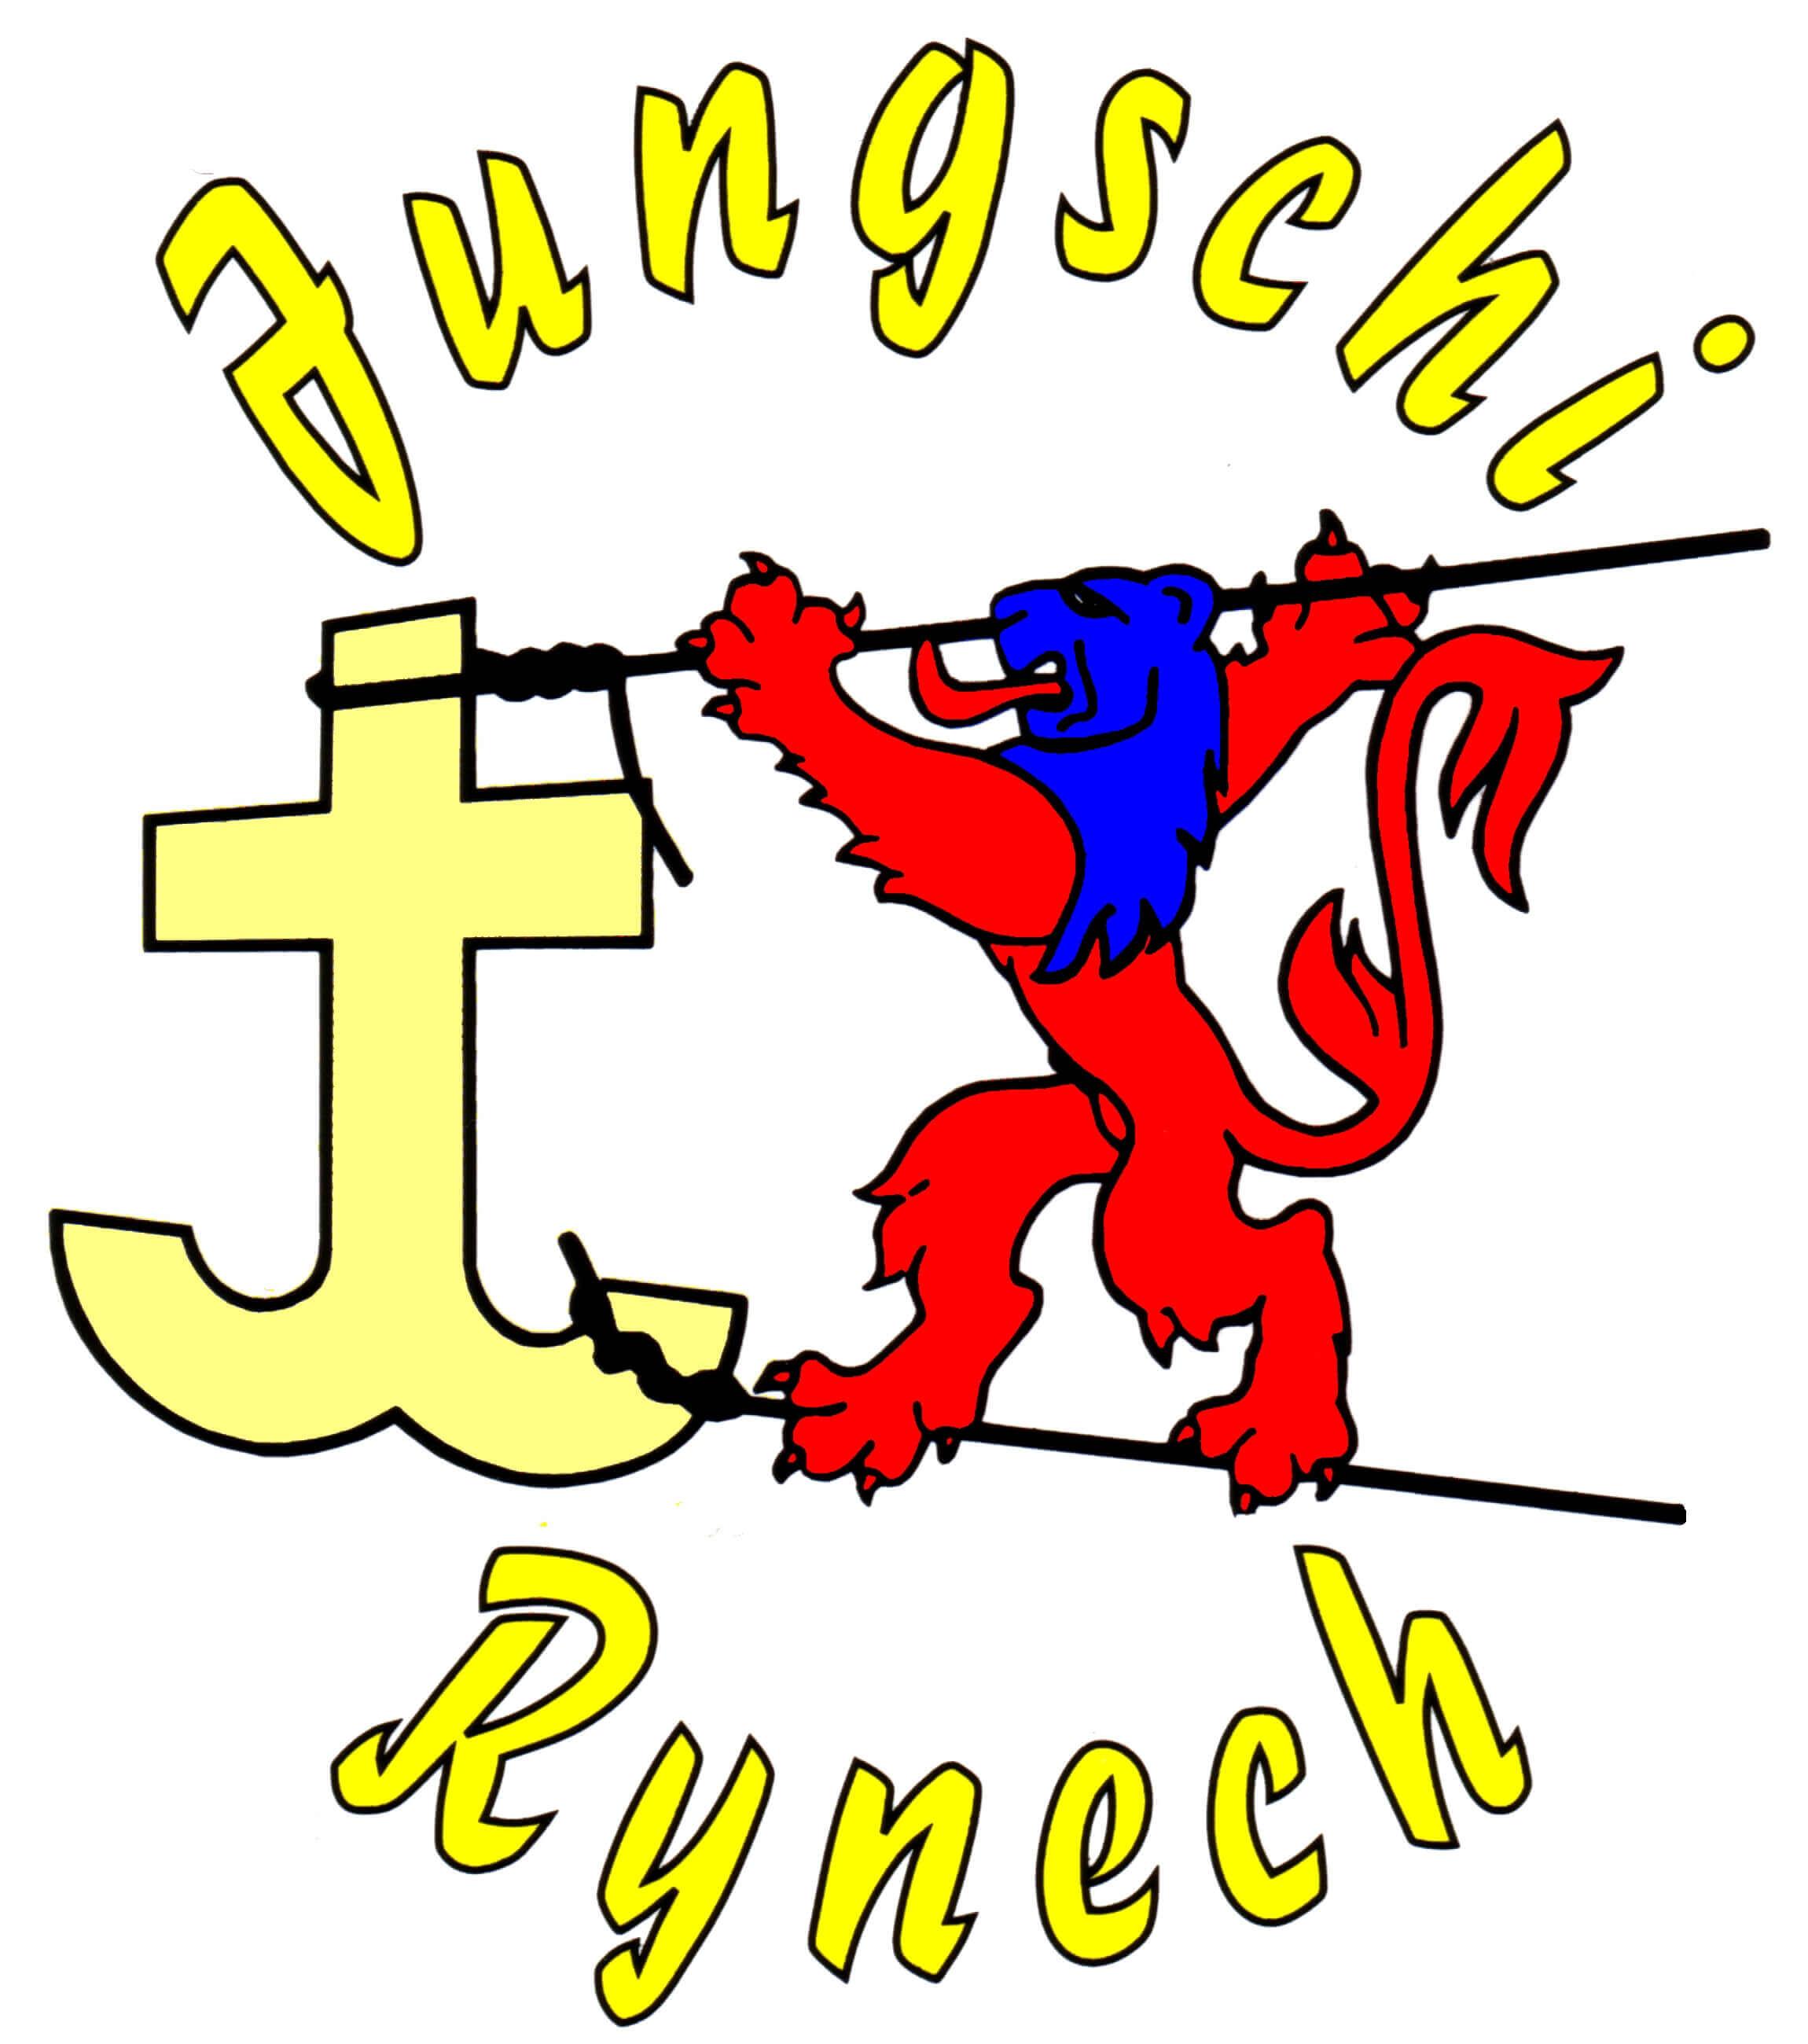 Logo_Jungschi-Rynech_farbig